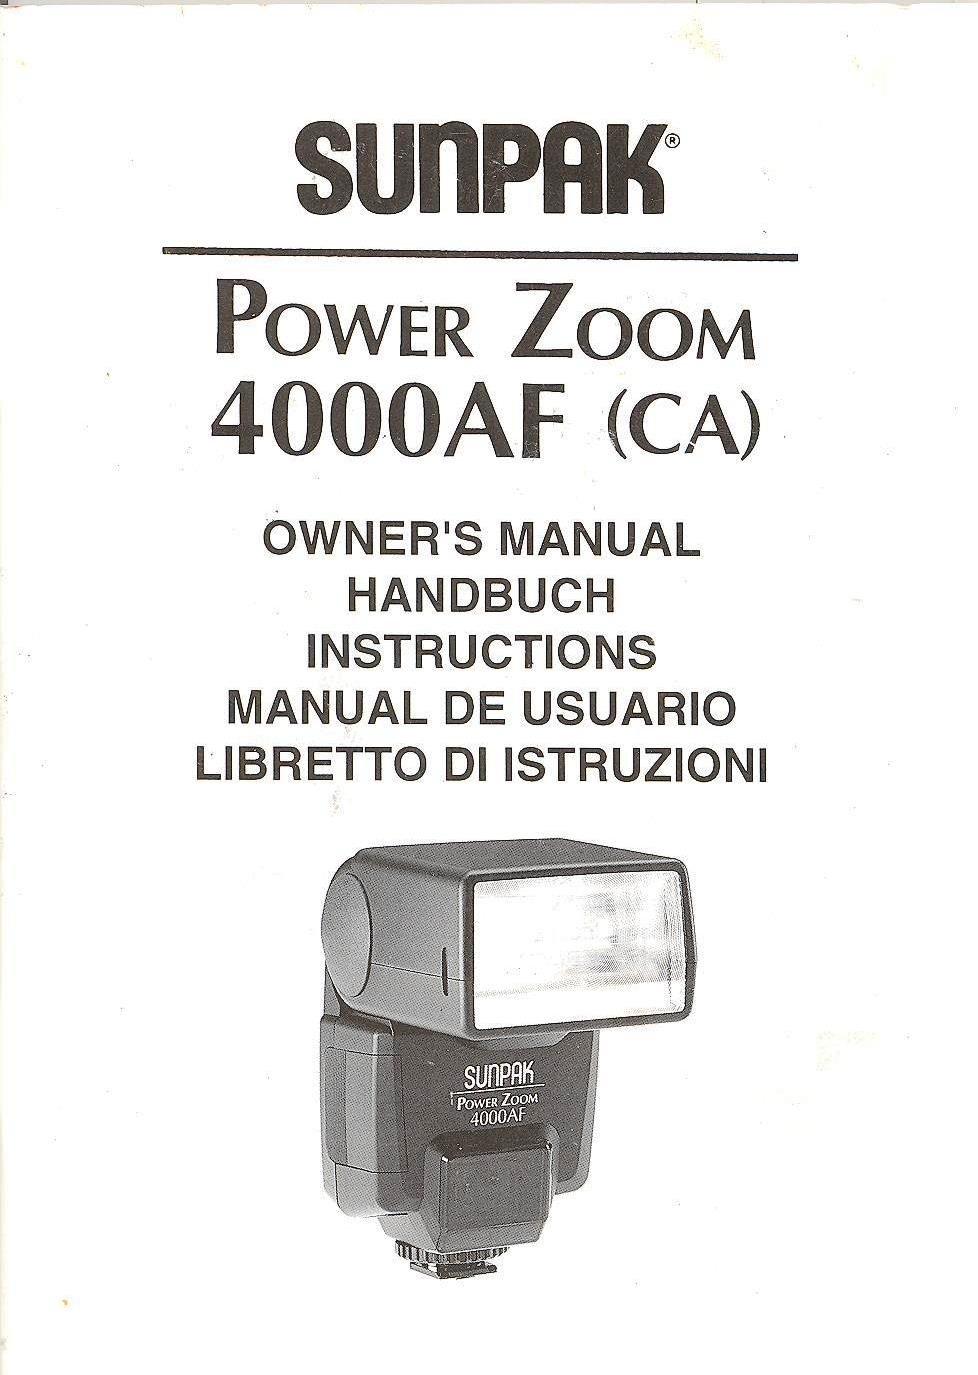 Sunpak power zoom 4000 af flash for nikon | #1791825945.